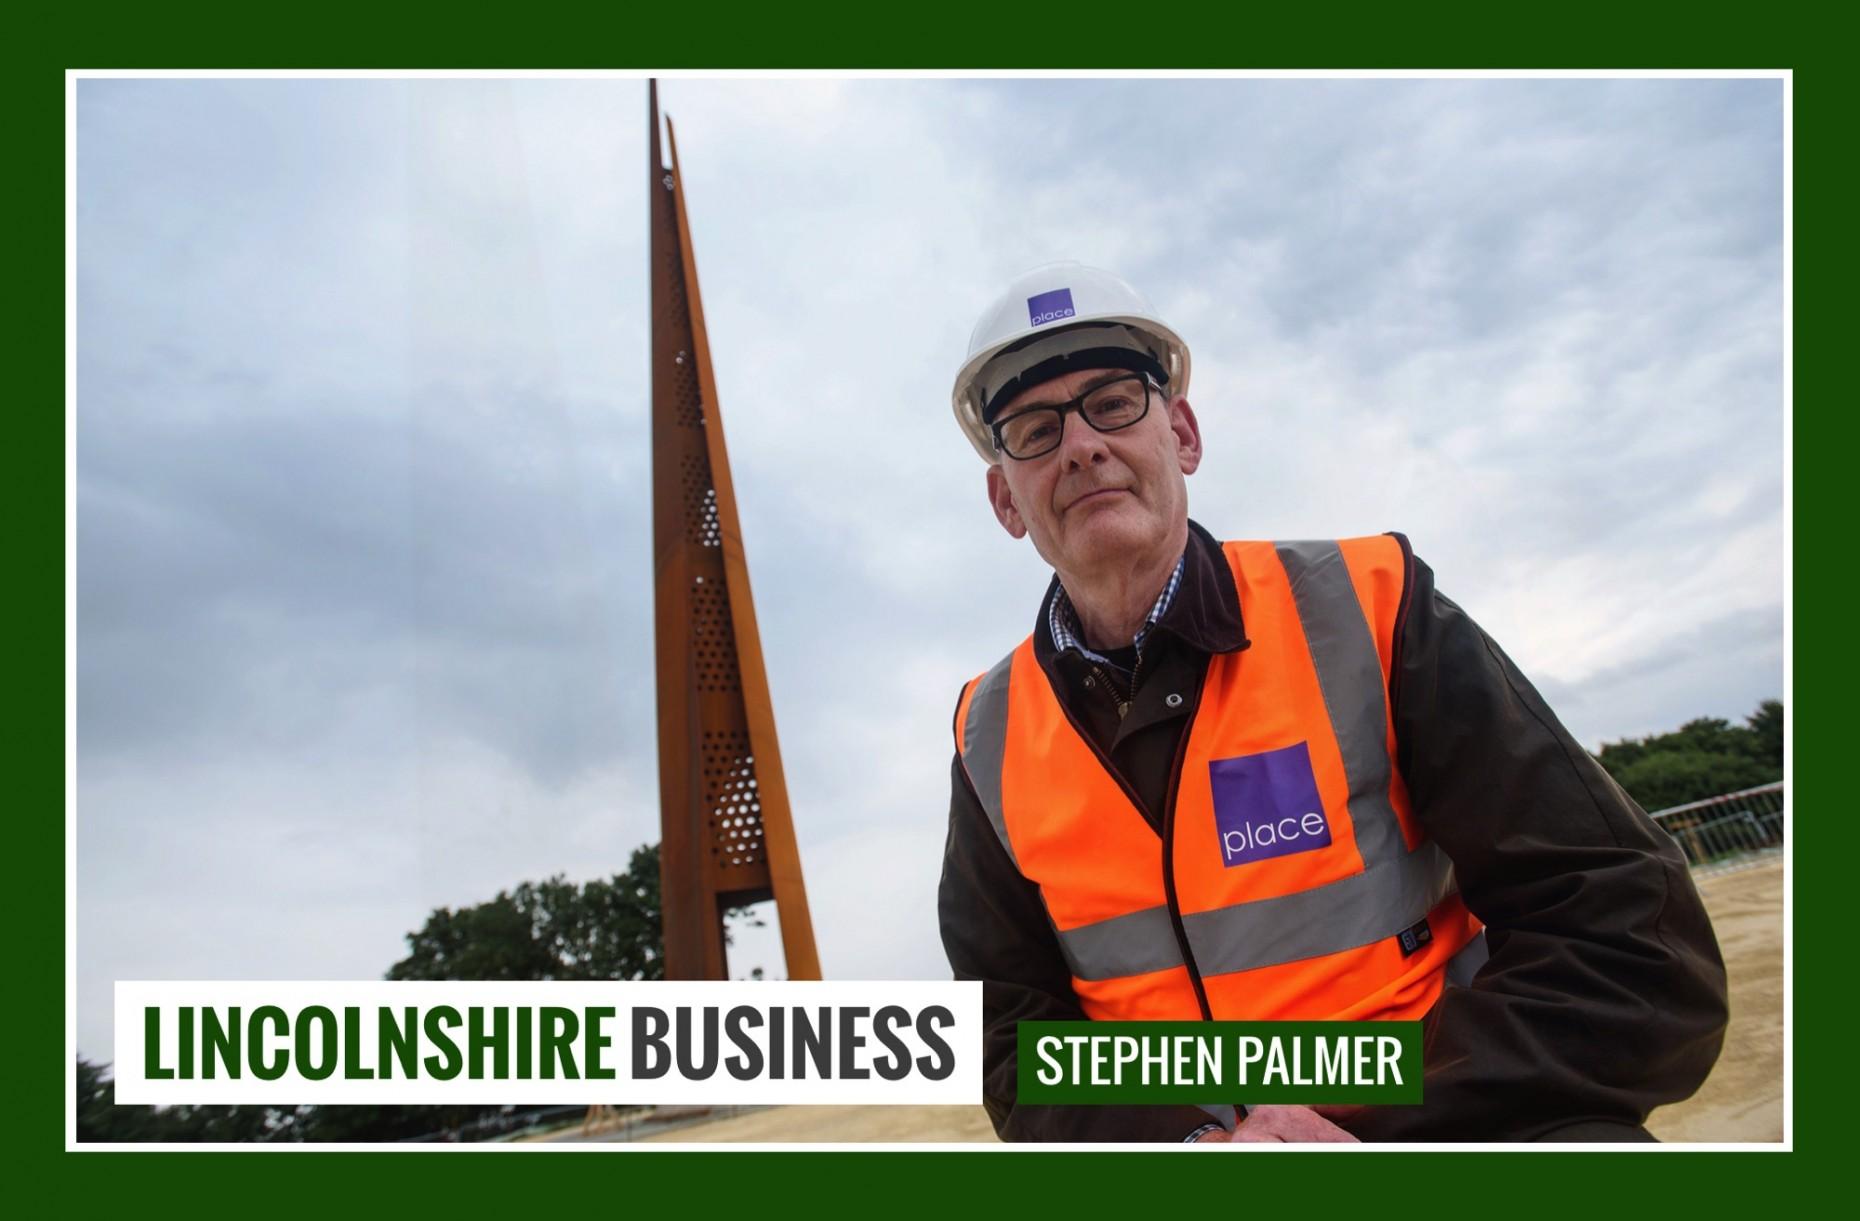 Lincolnshire Business 41 Stephen Palmer